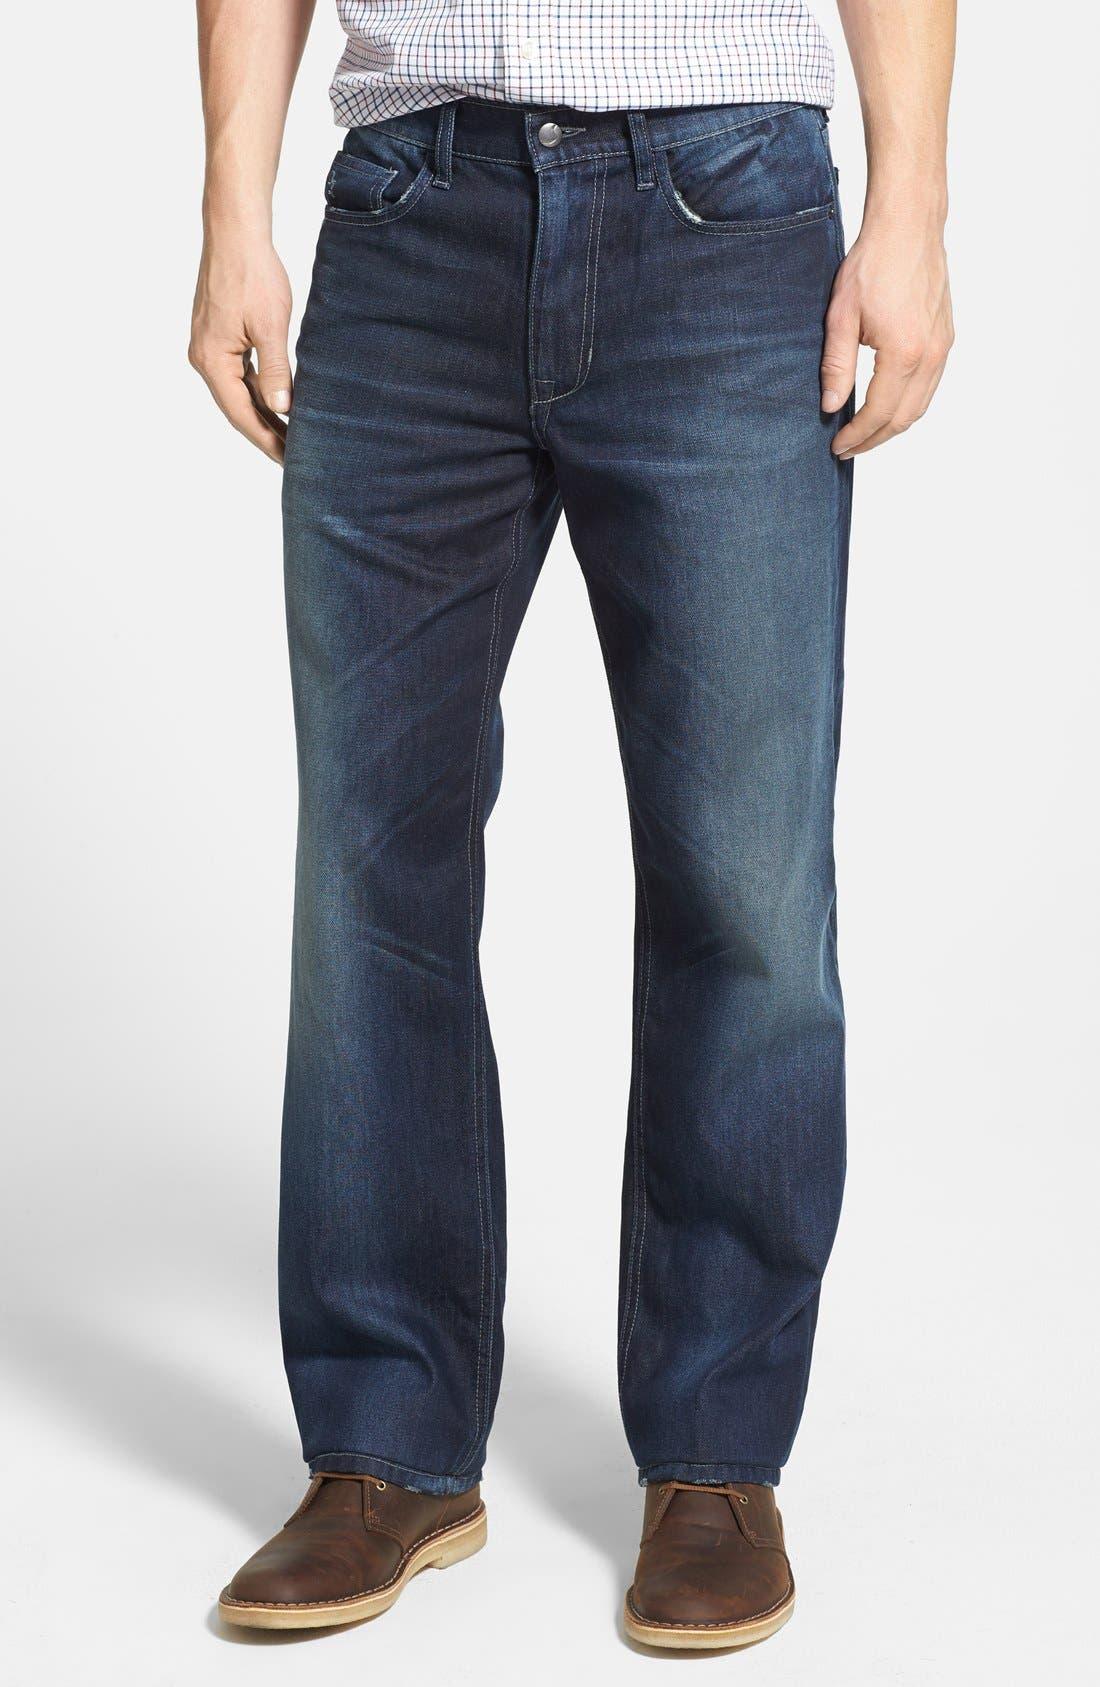 Alternate Image 1 Selected - Joe's 'Rebel' Relaxed Fit Jeans (Harrison)